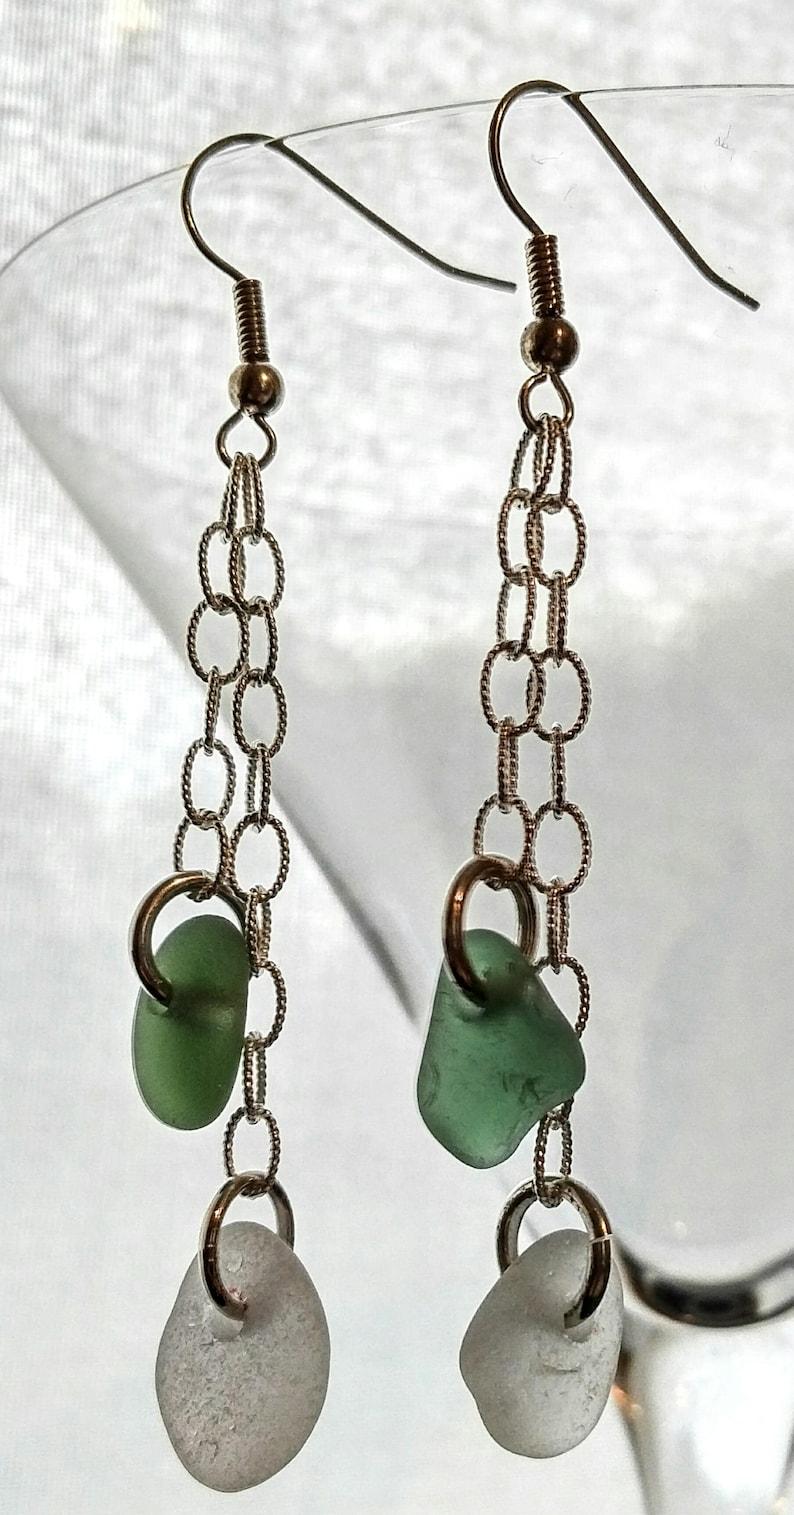 beach glass earrings sea glass and chain earrings siver earring with sea glass Sea glass earrings